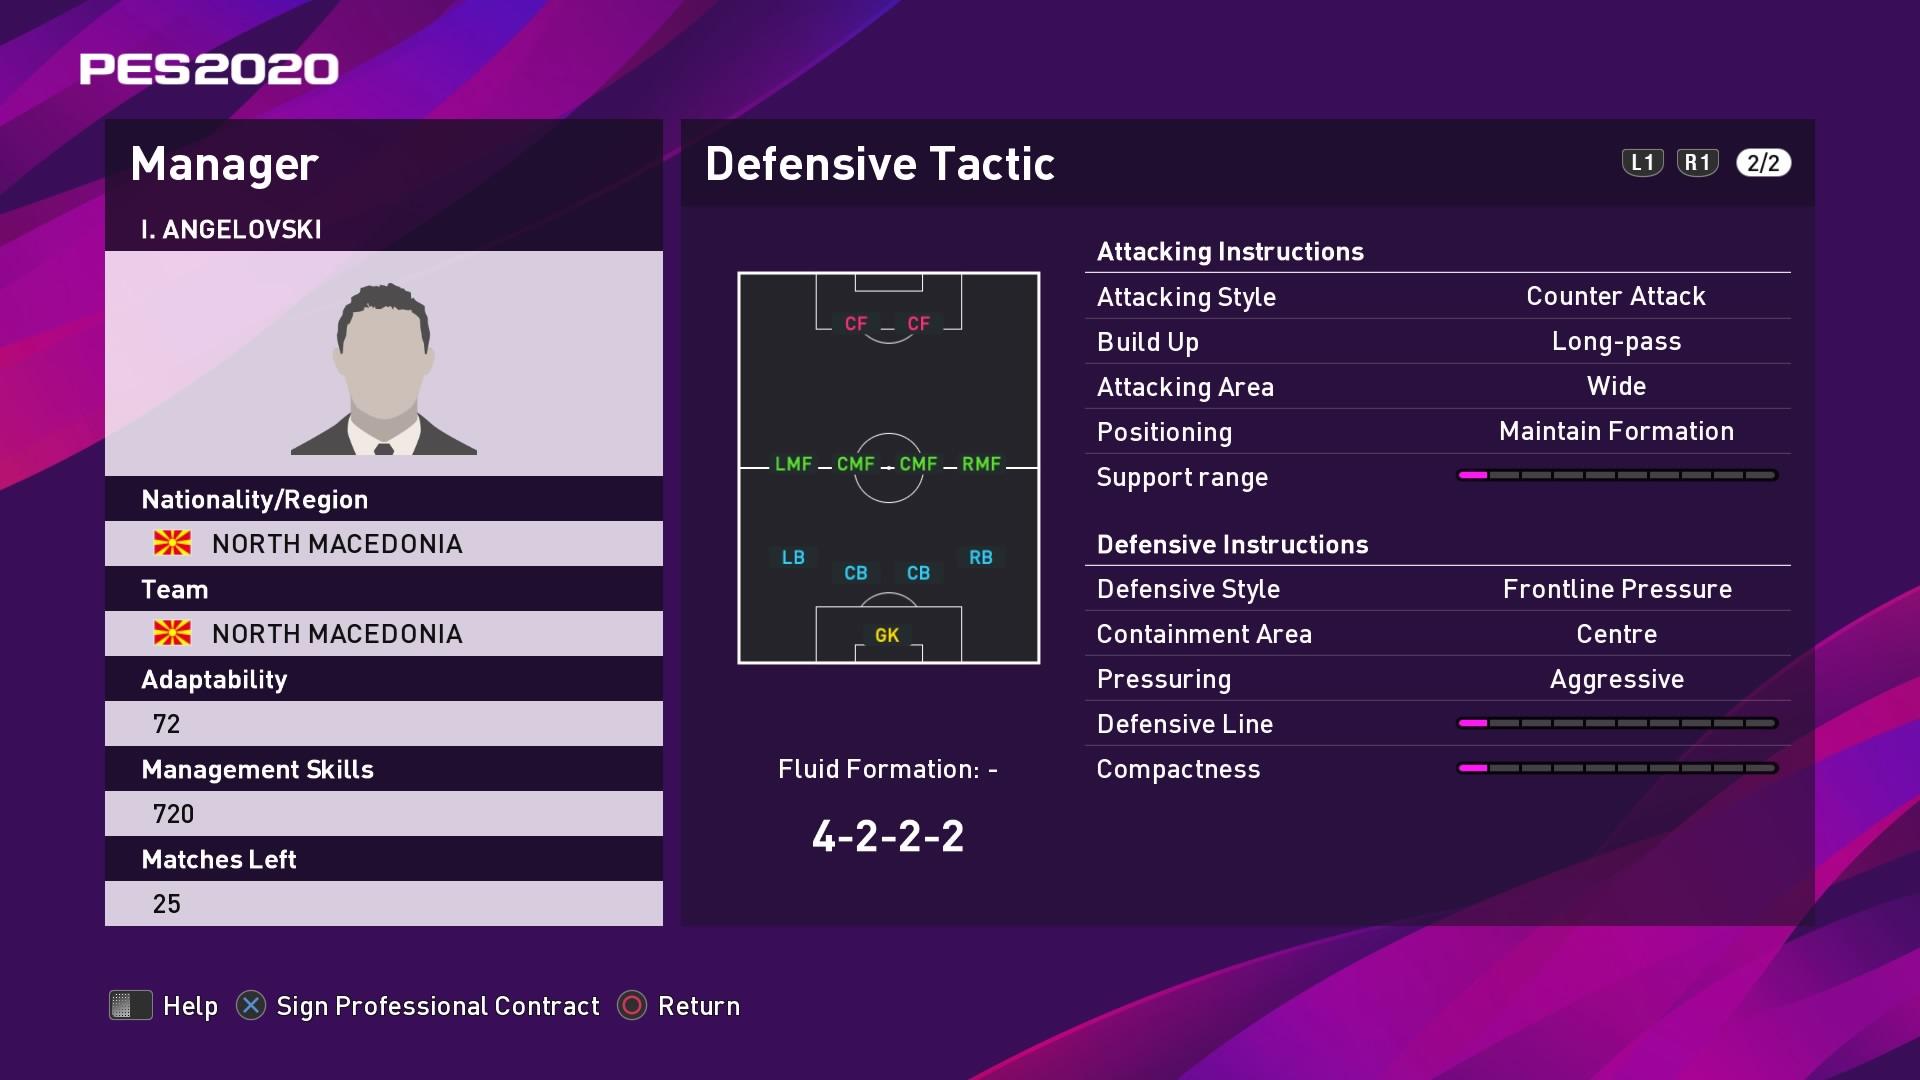 I. Angelovski (Igor Angelovski) Defensive Tactic in PES 2020 myClub